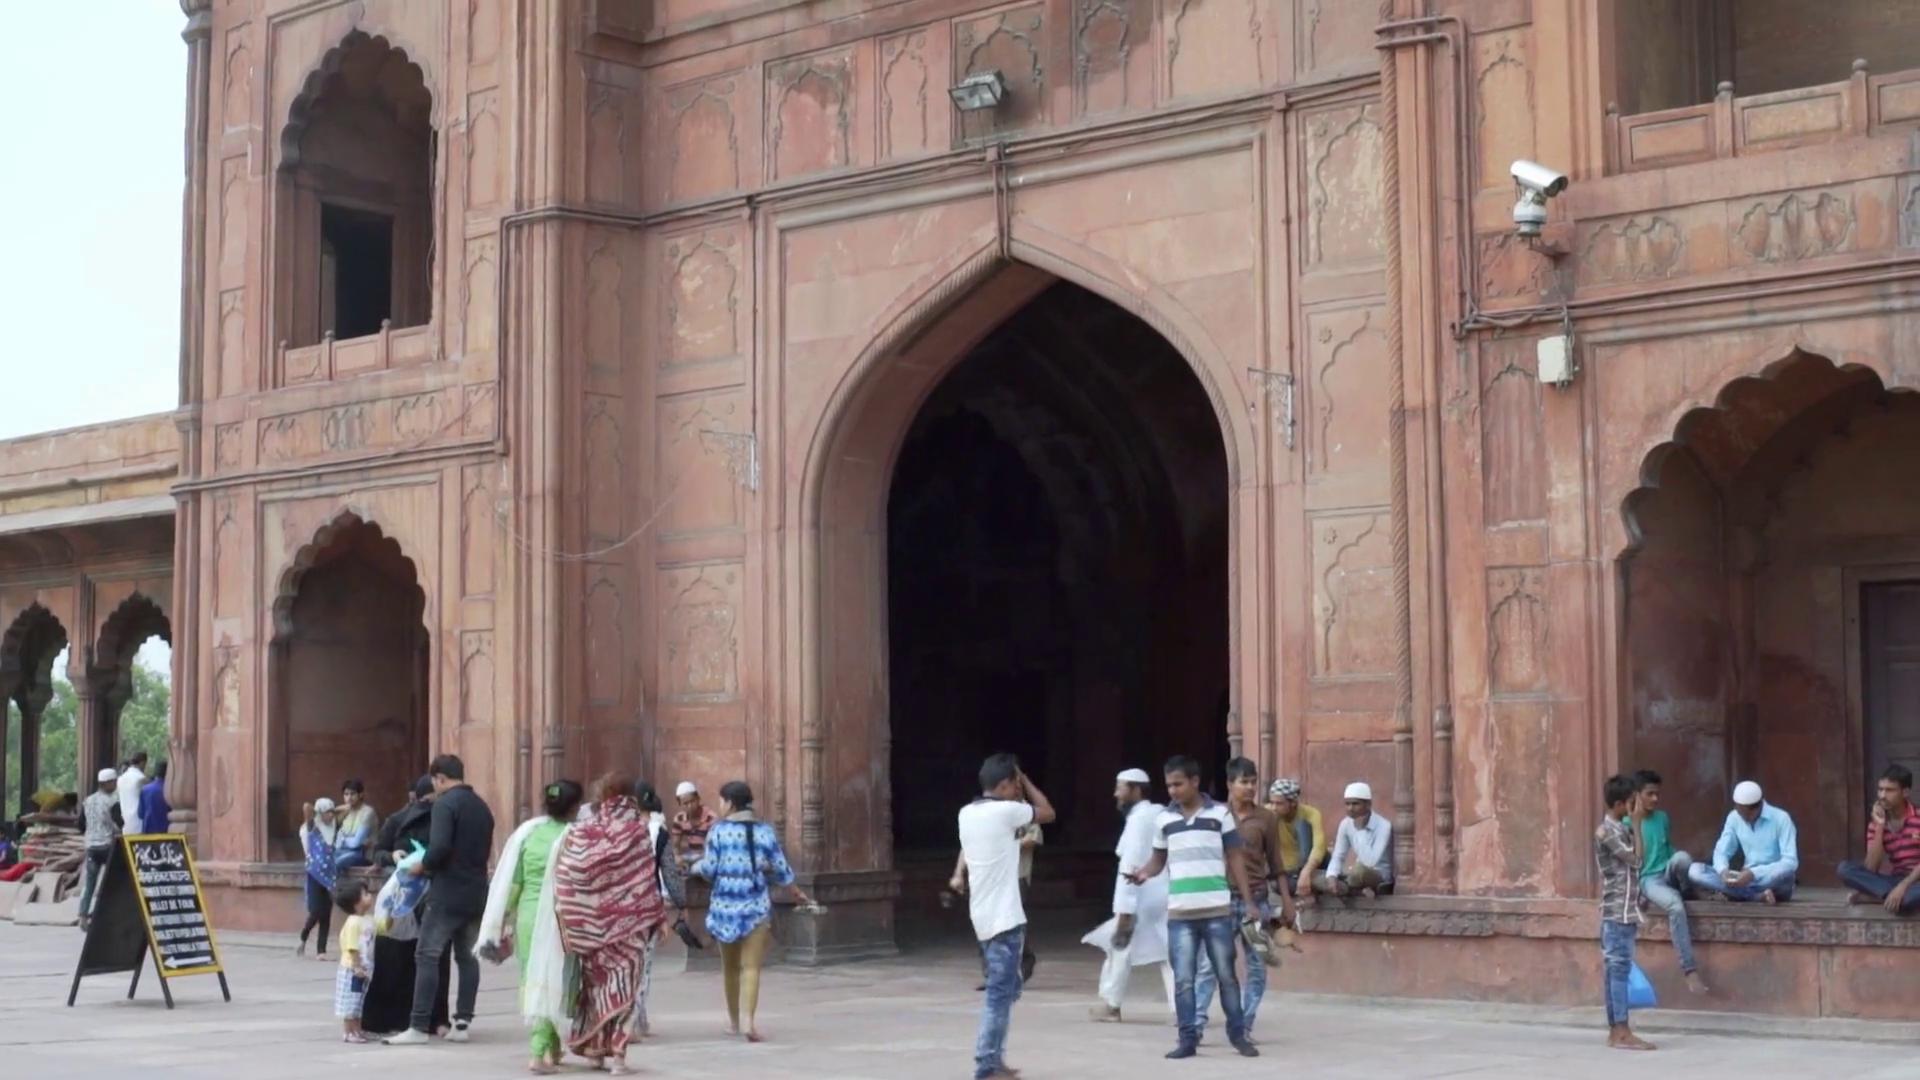 People exit Jama Masjid mosque through main gate entrance, New Delhi ...